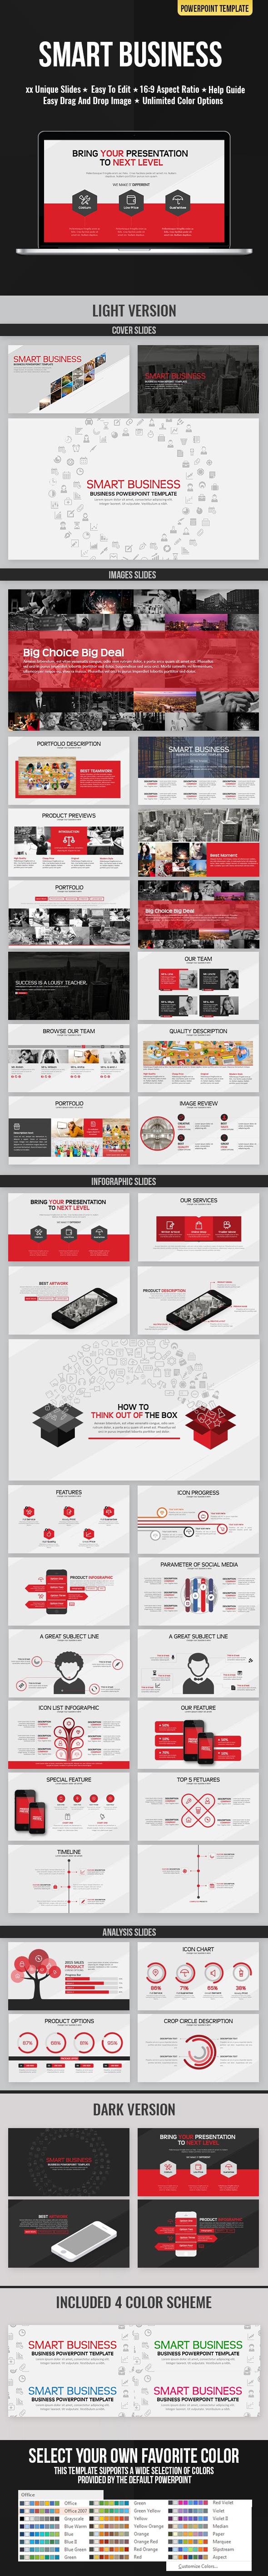 Smart Business Presentation - Business PowerPoint Templates